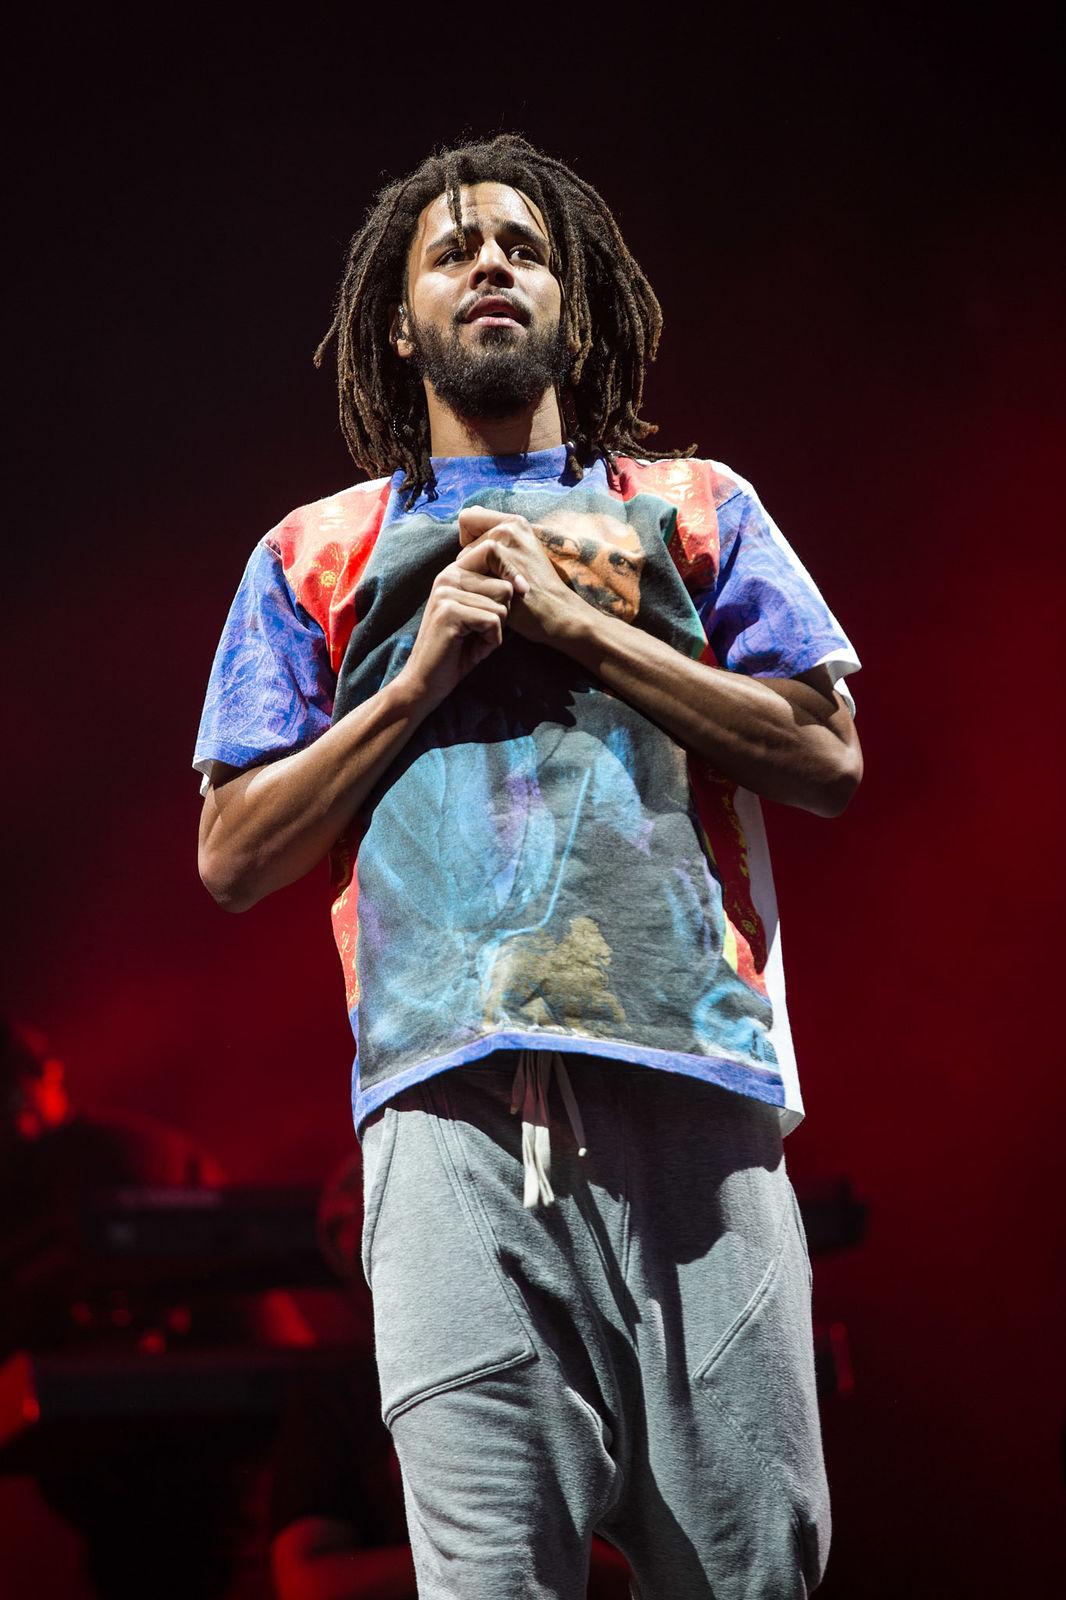 J.Cole